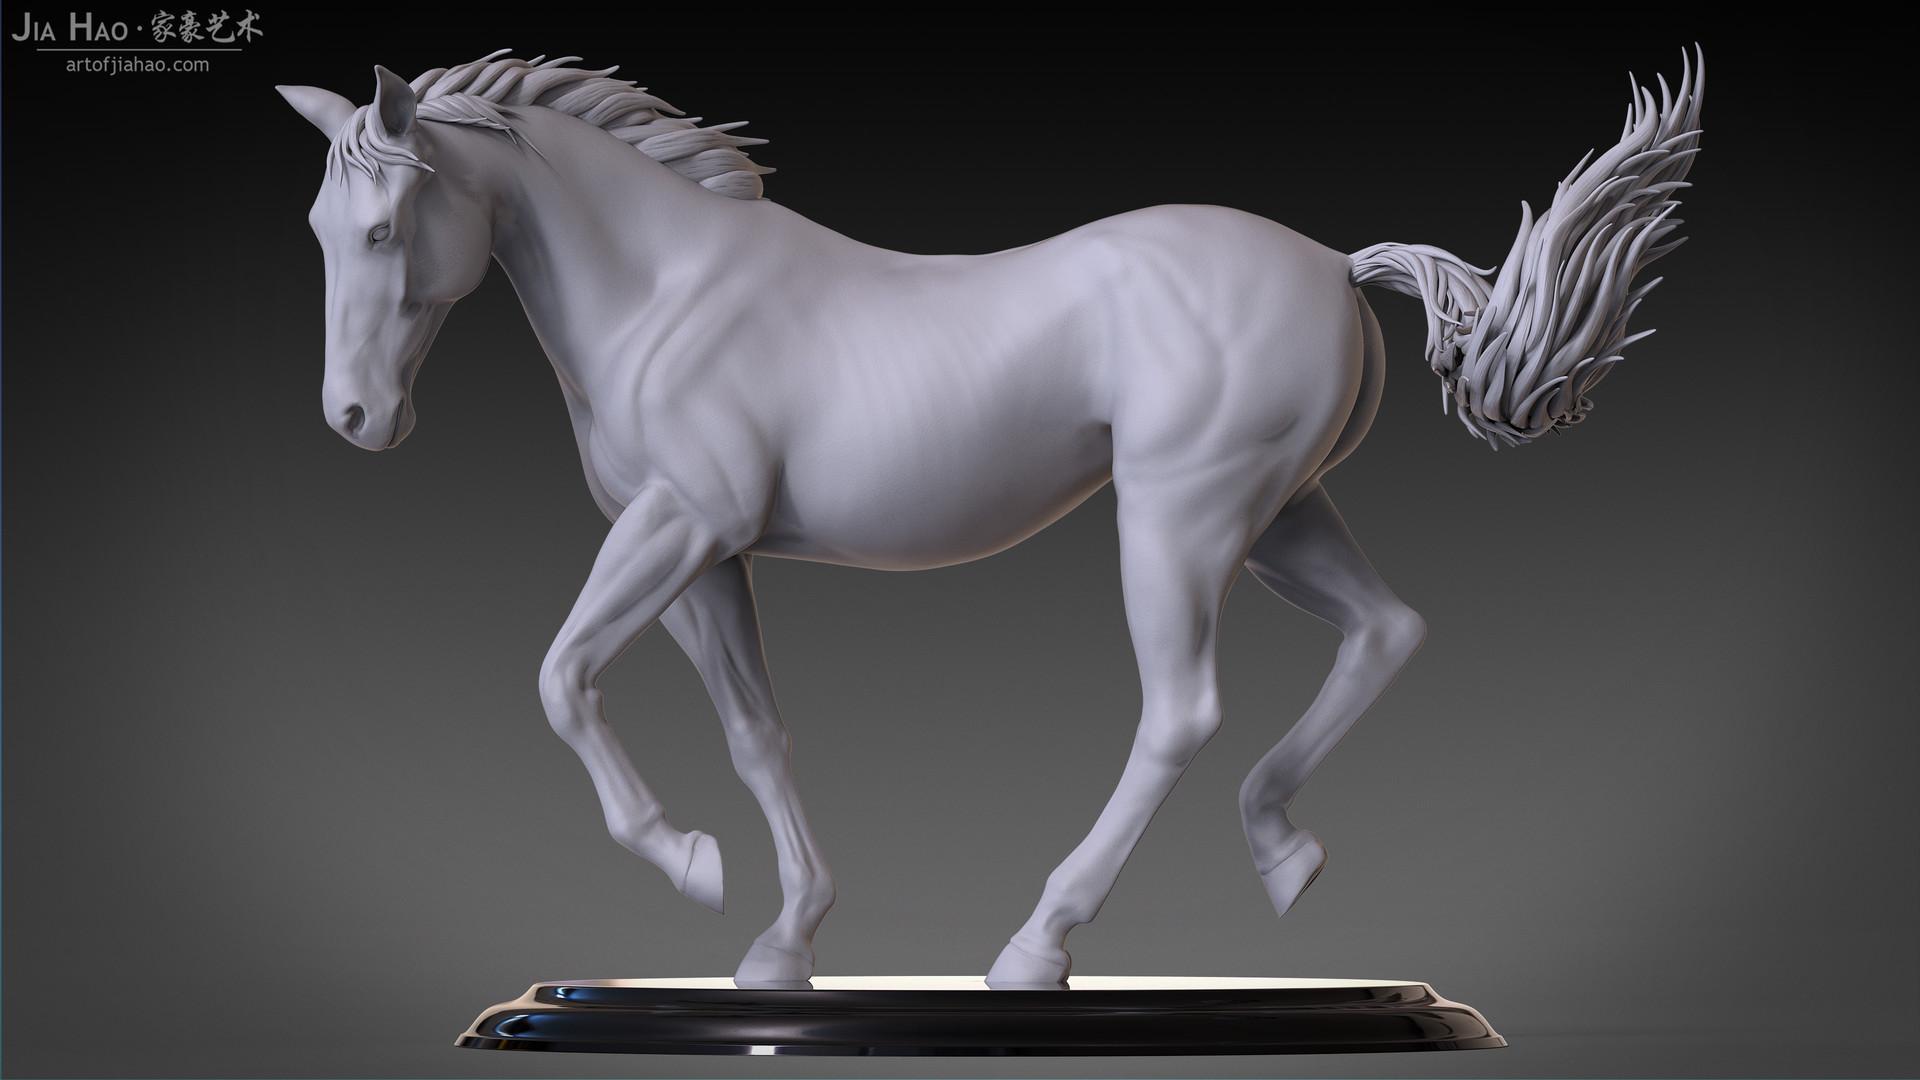 Jia hao horse sculpture comp clay 04